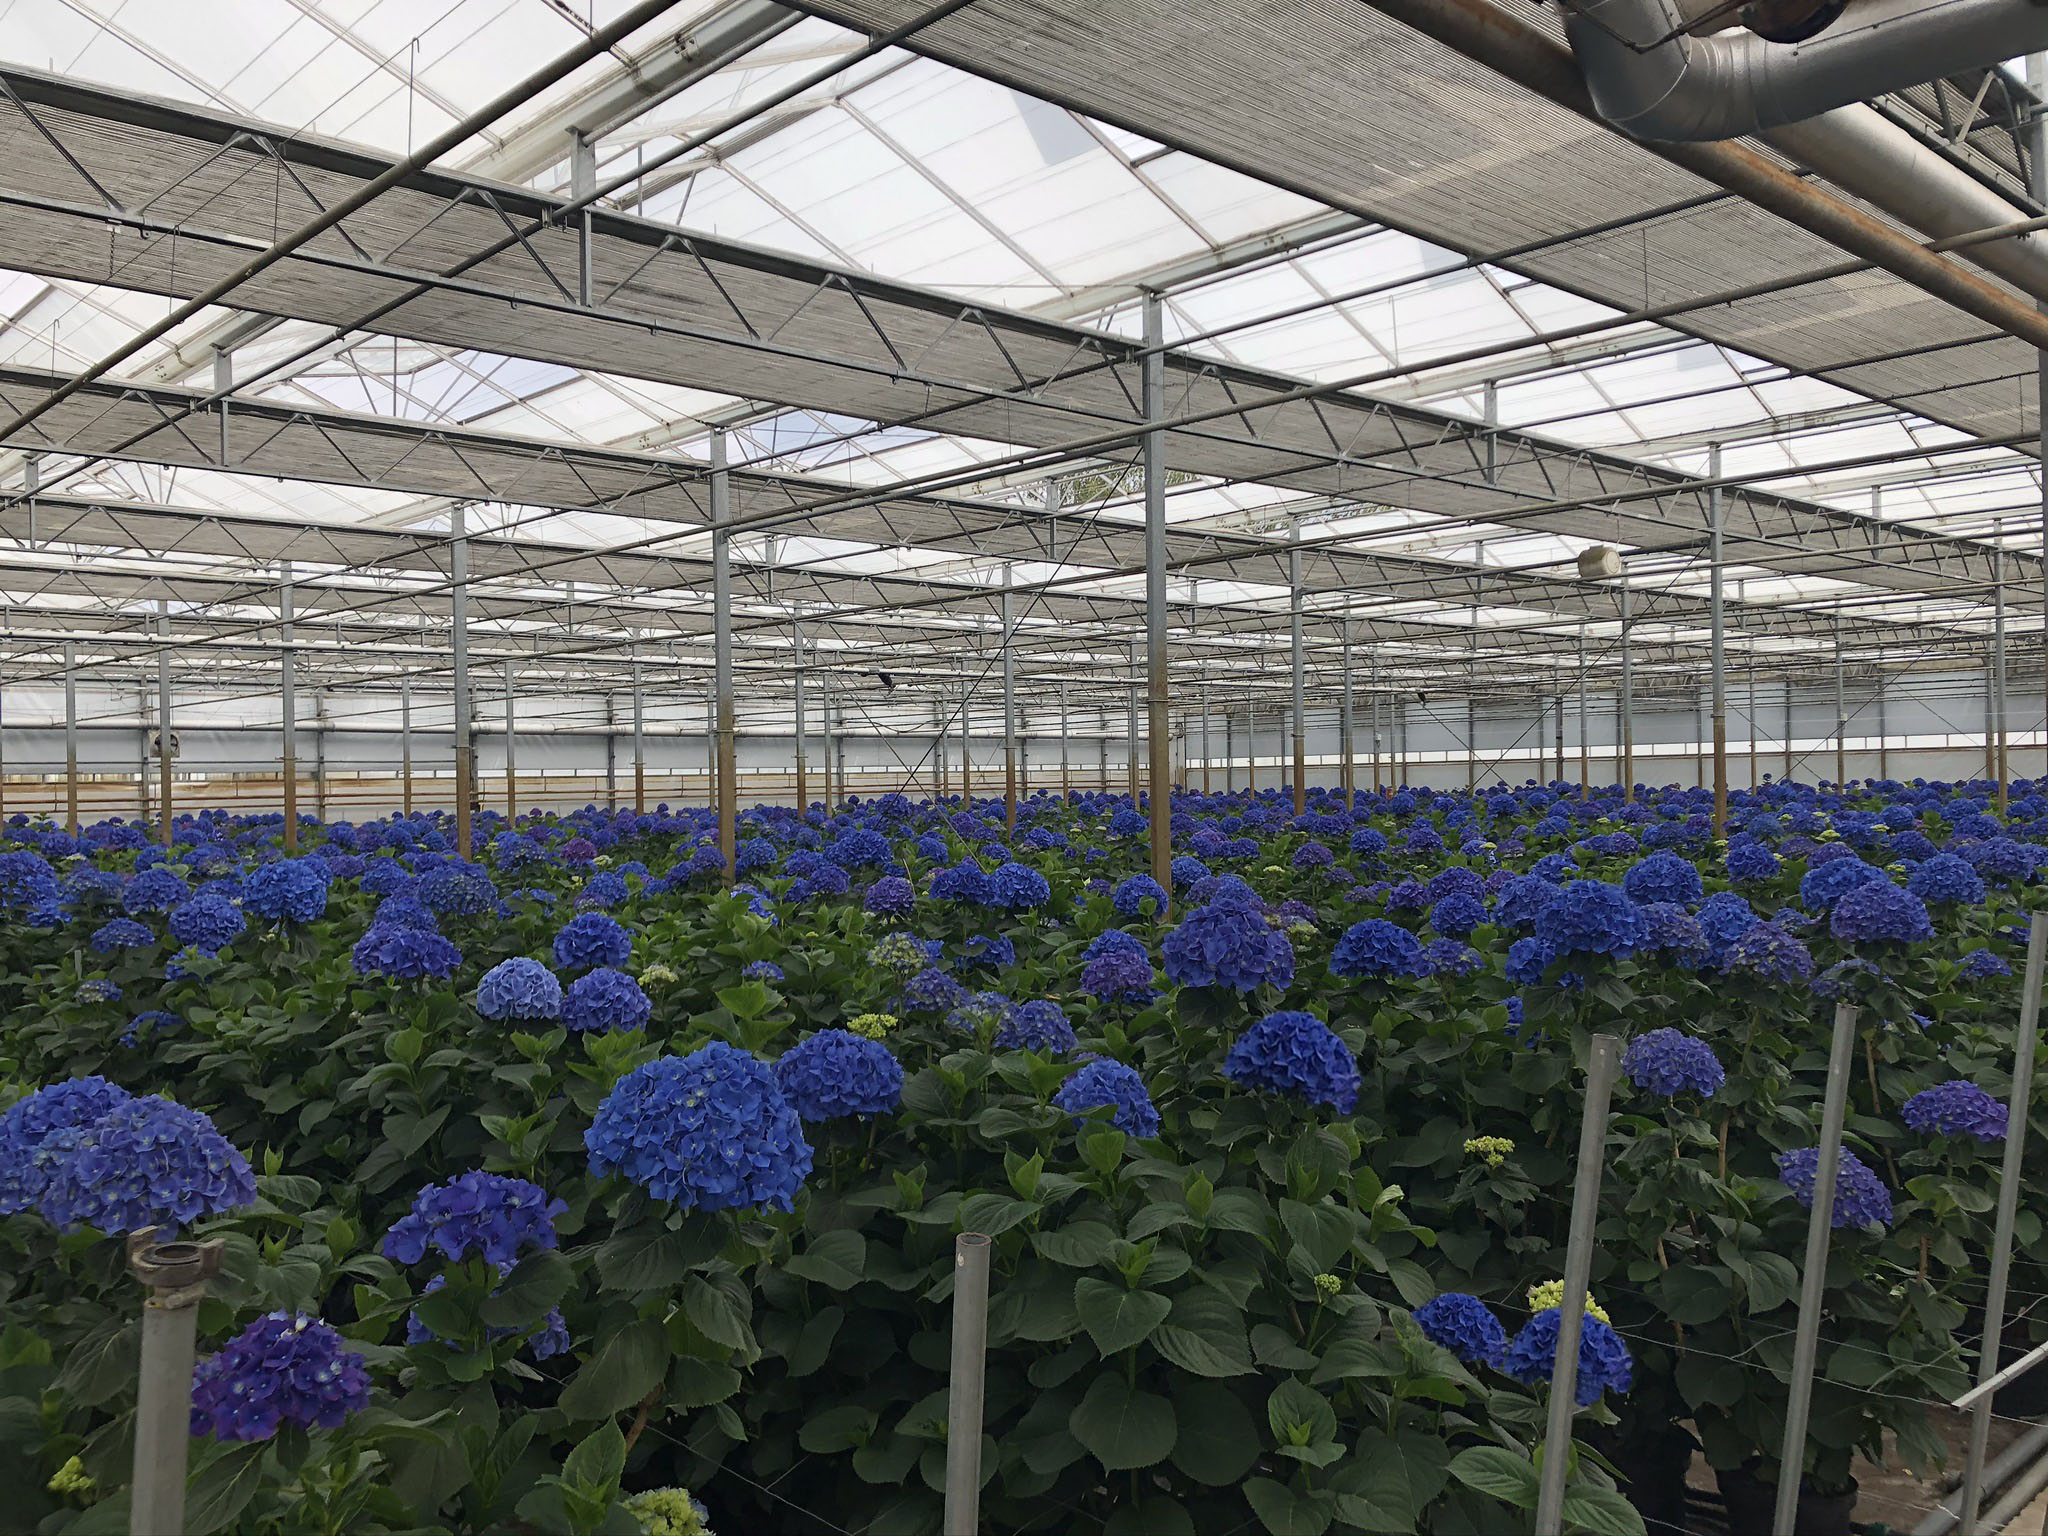 Pimpernel JLP Flowers / Kwekerij Borgers